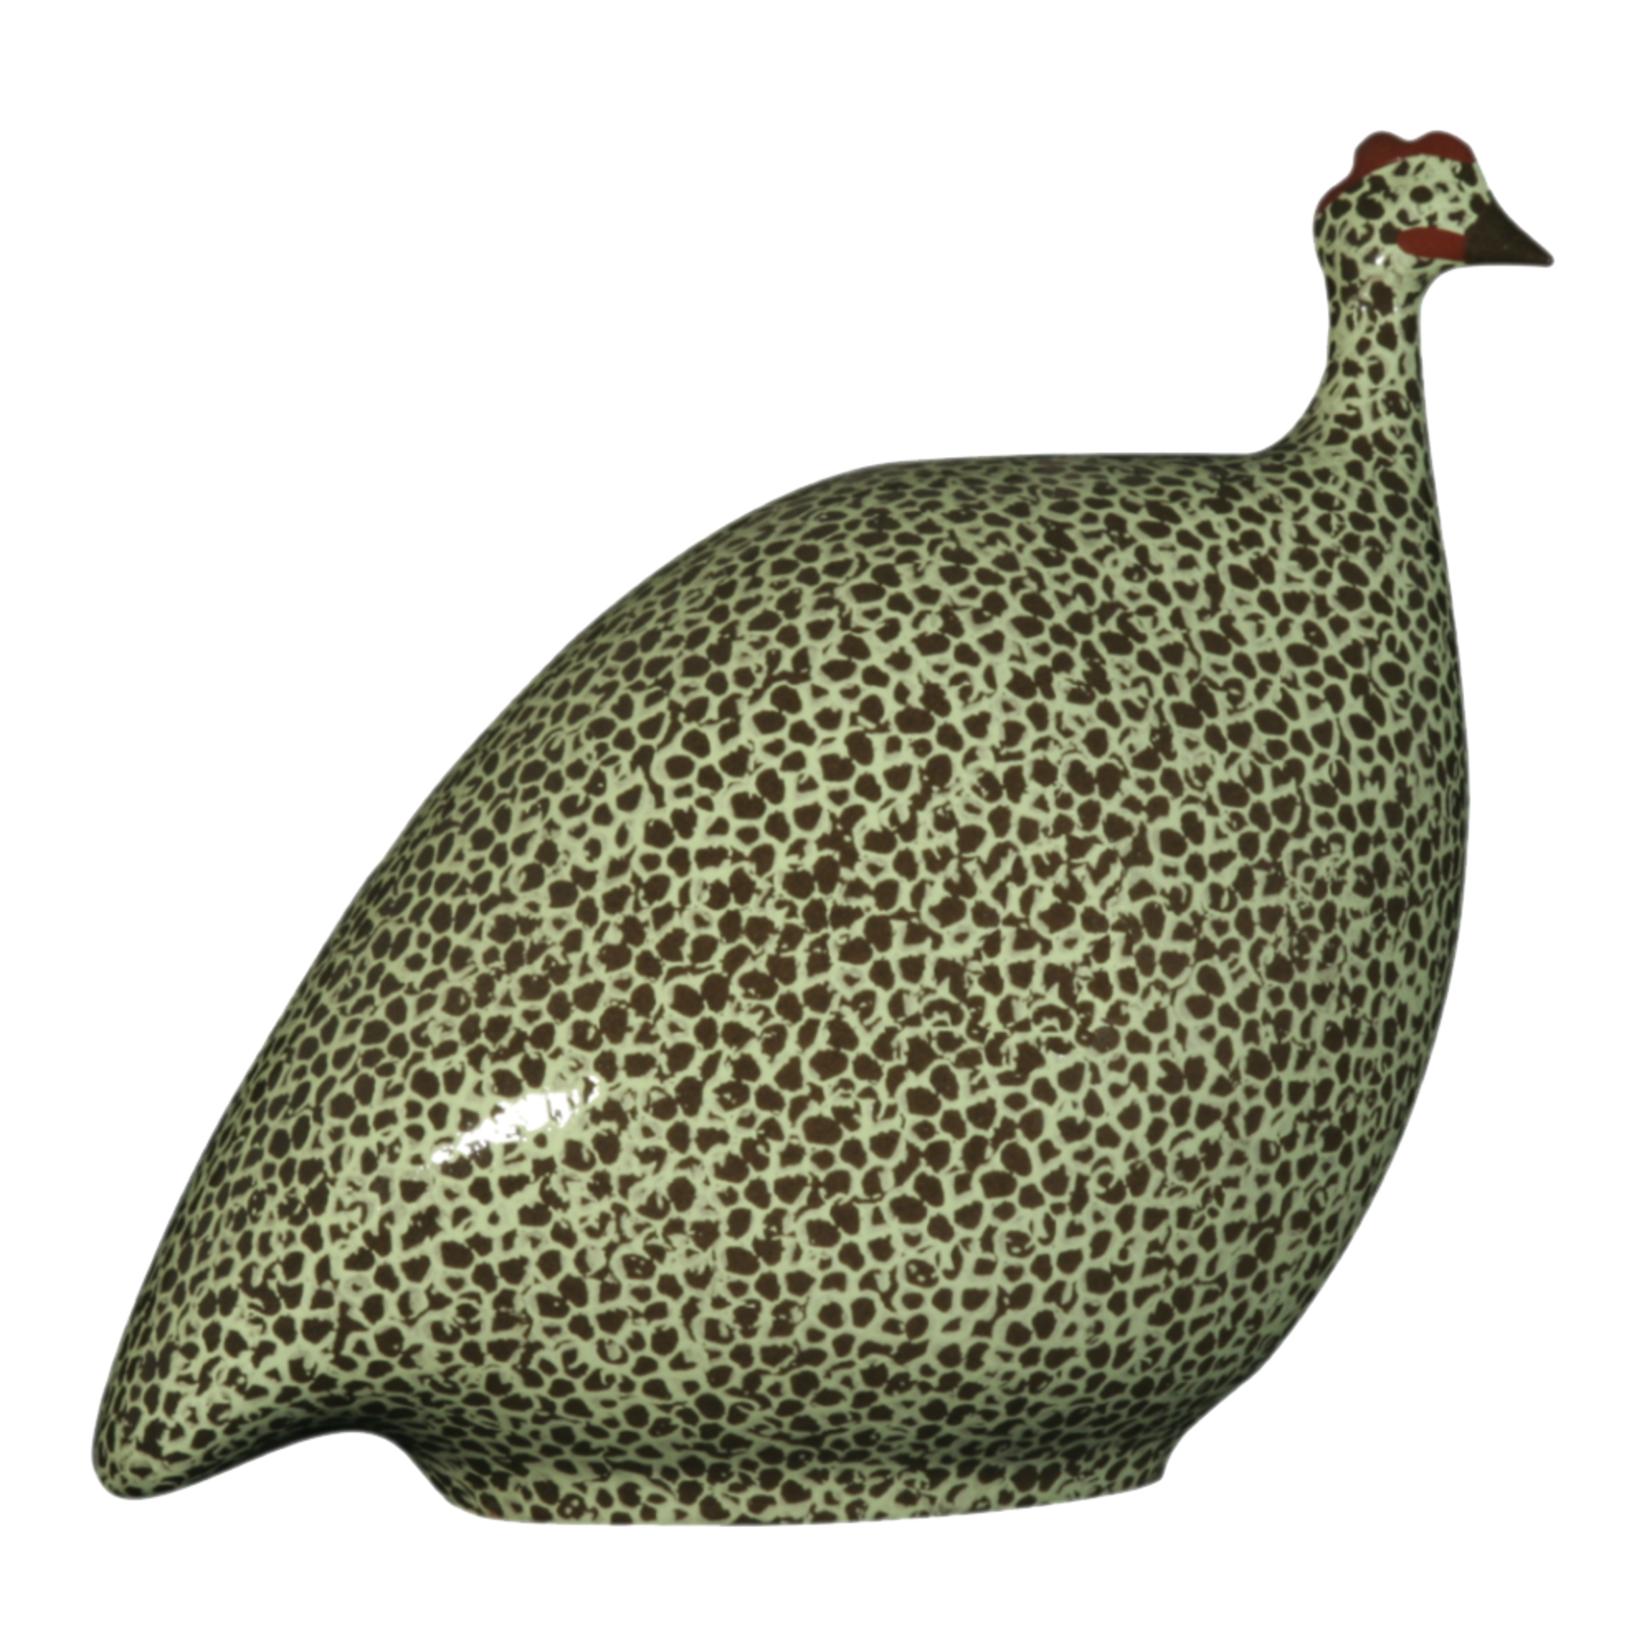 Black Speckled Apple Green French Guinea Hen